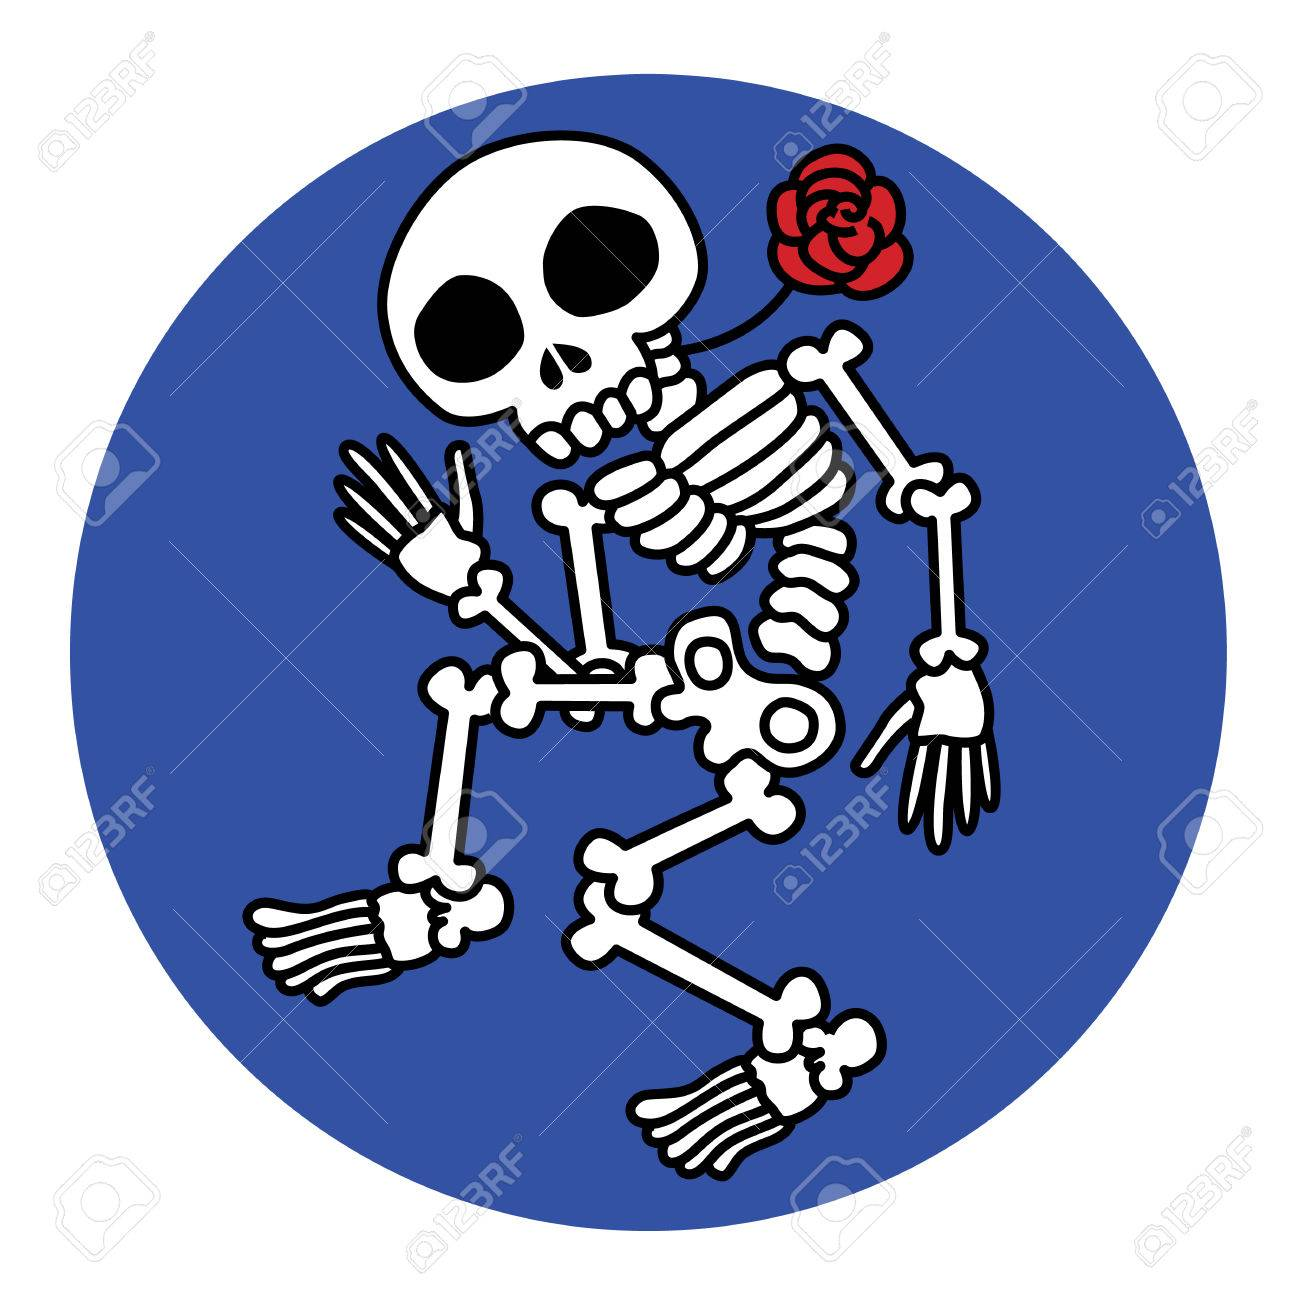 dancing skeletons vector illustration - Funny Halloween design - 35354537